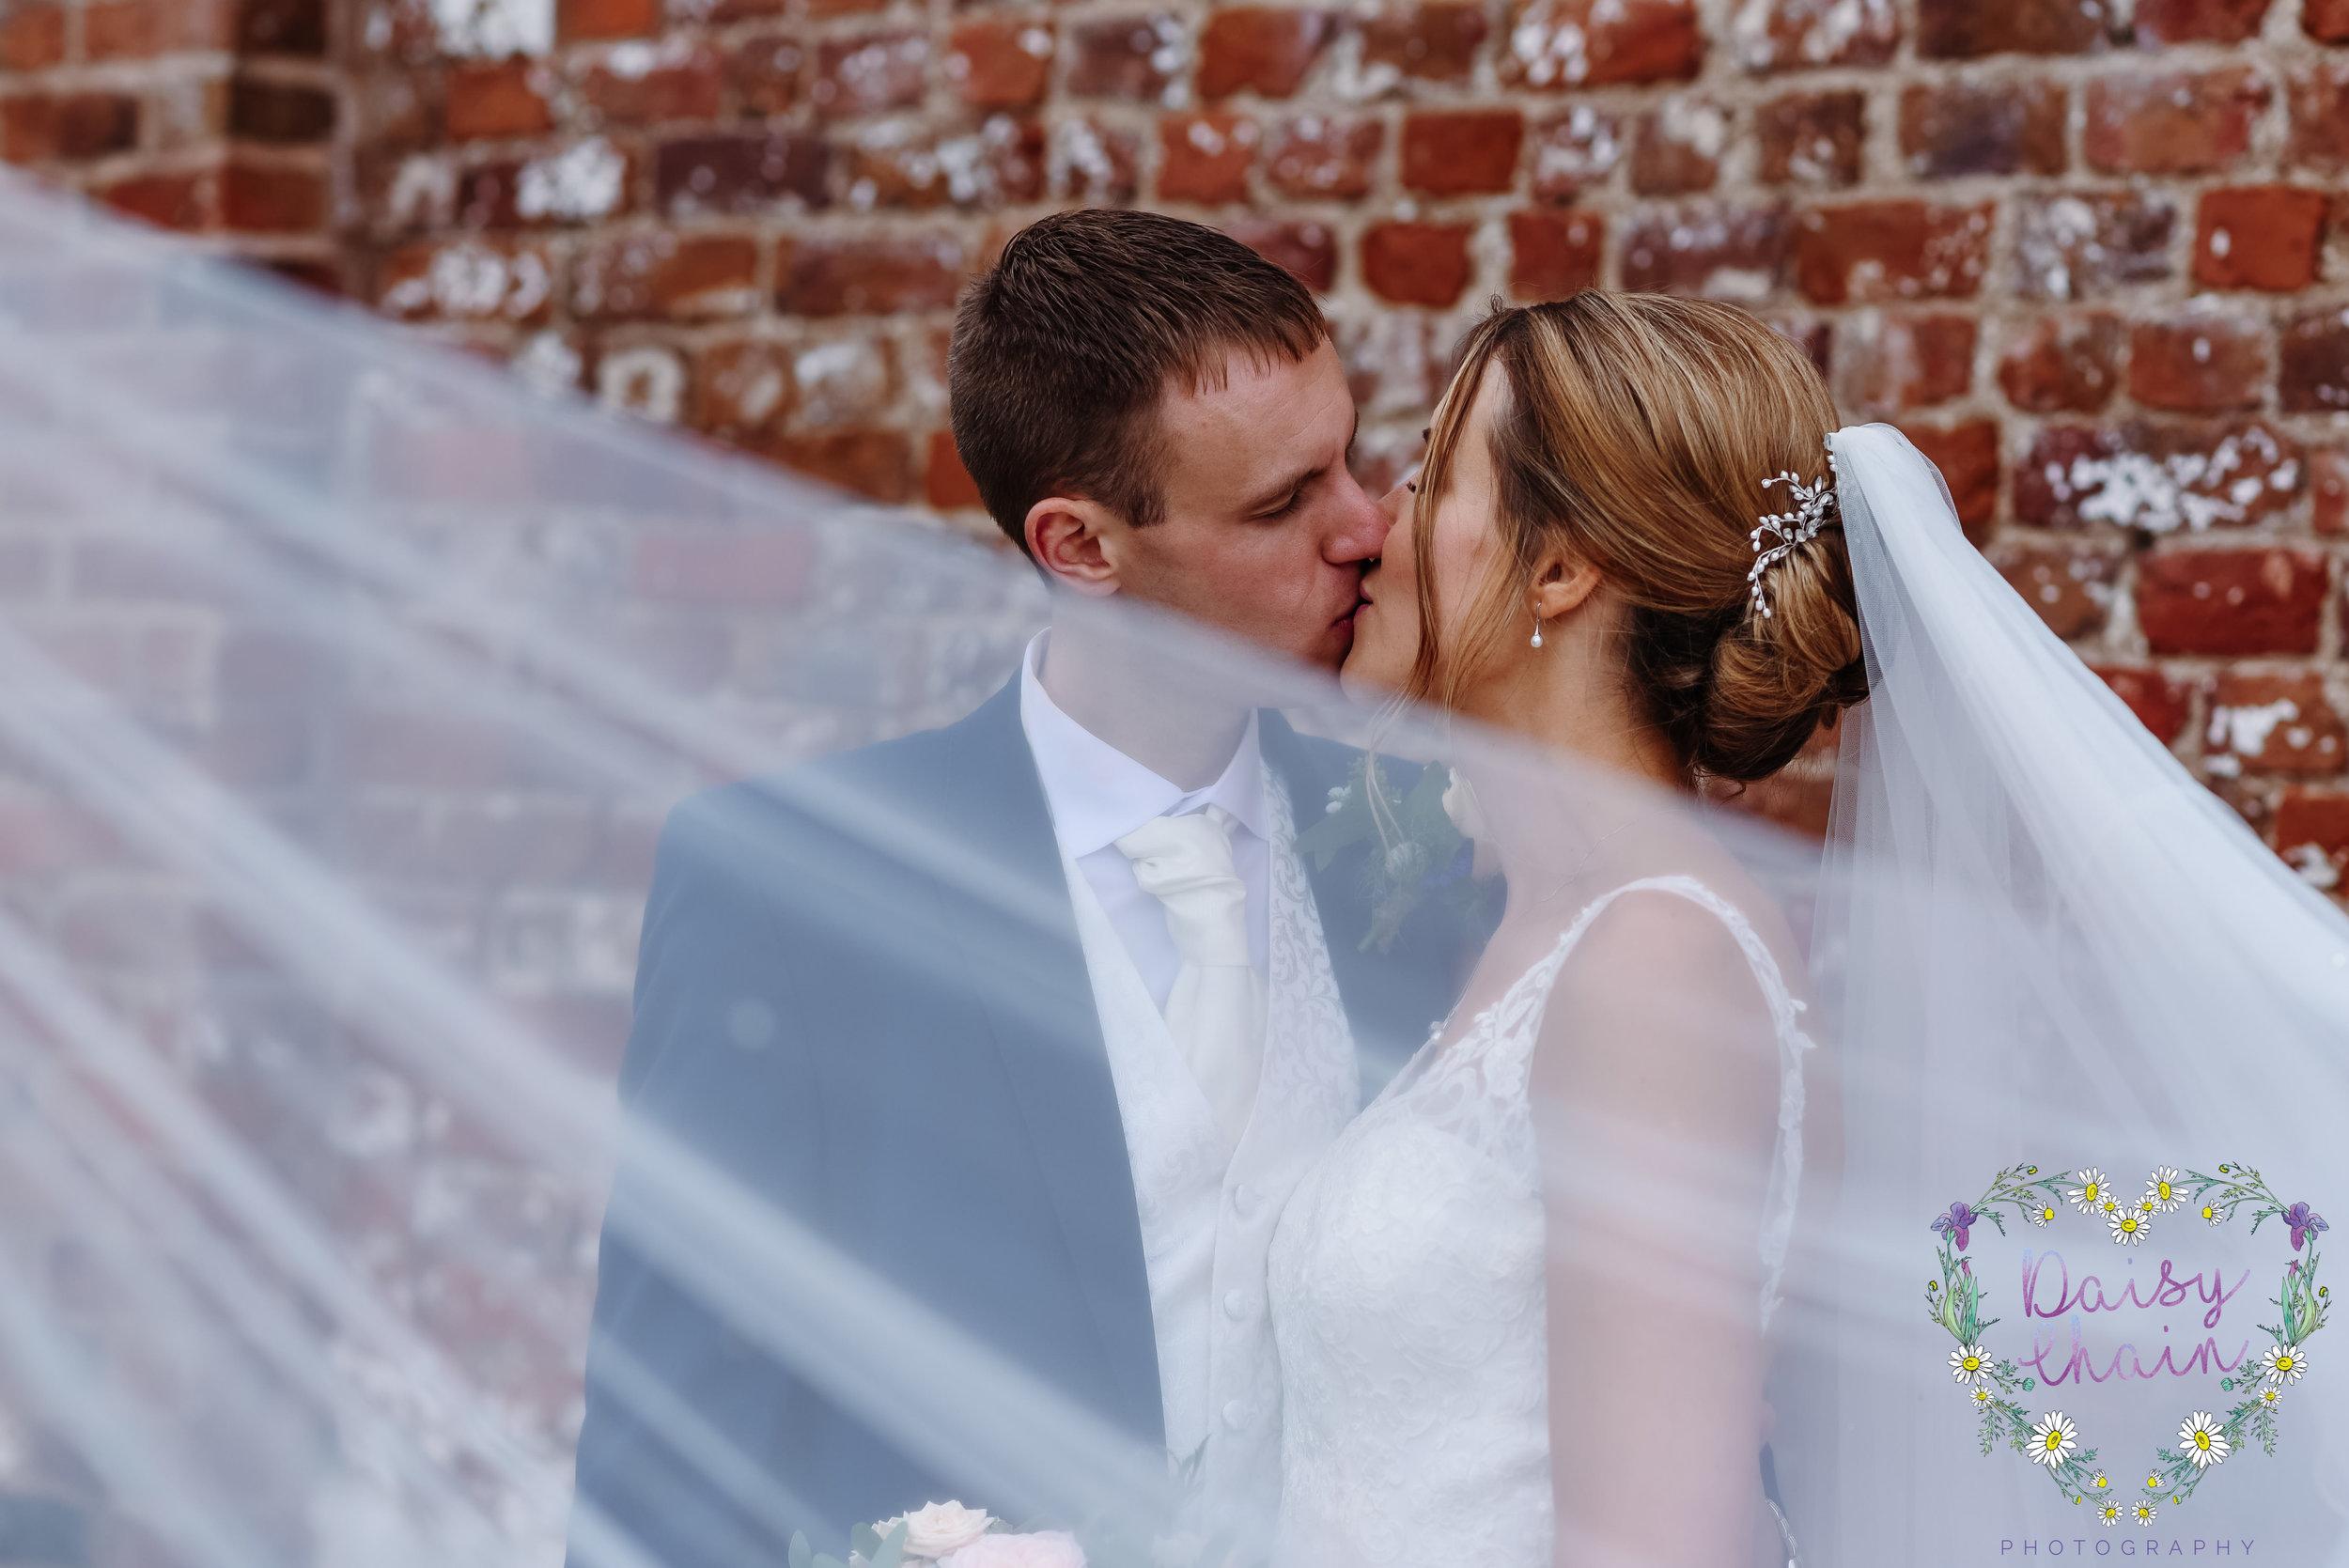 Veil shot - wedding photography